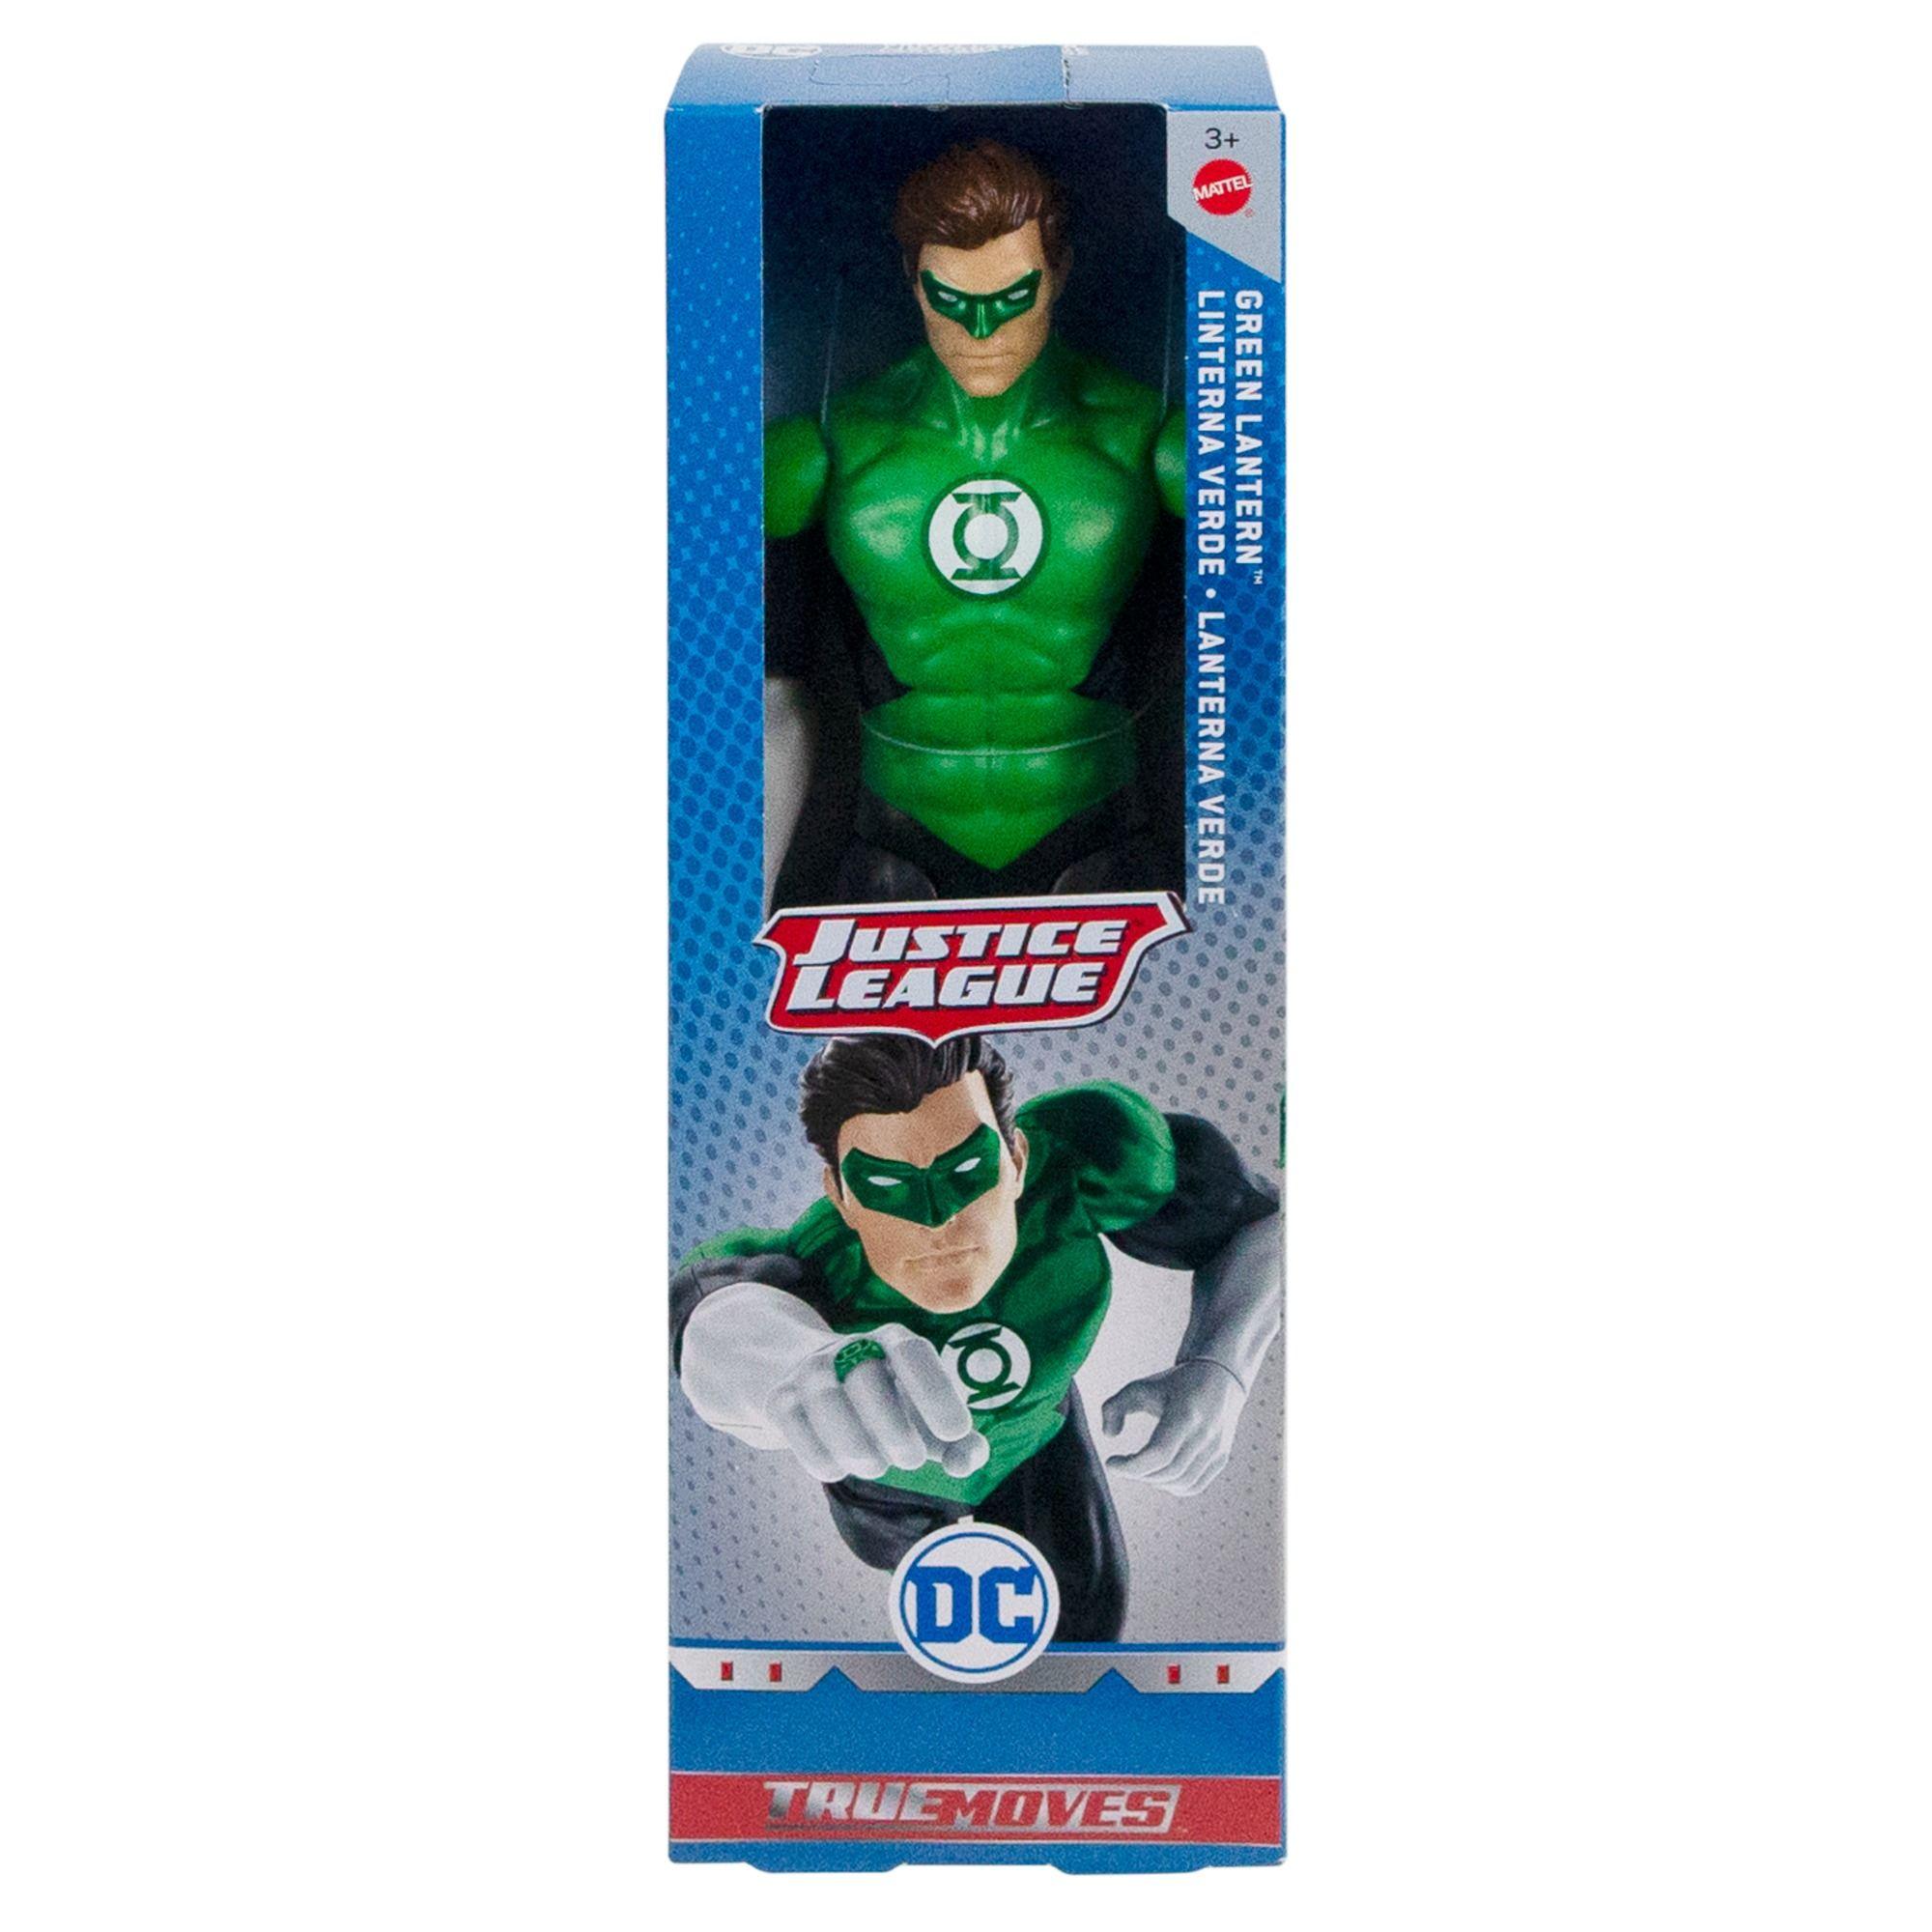 Dc Comics Justice League Green Lantern 12 Action Figure Walmart Com Justice League Action Figures Dc Comics Action Figures